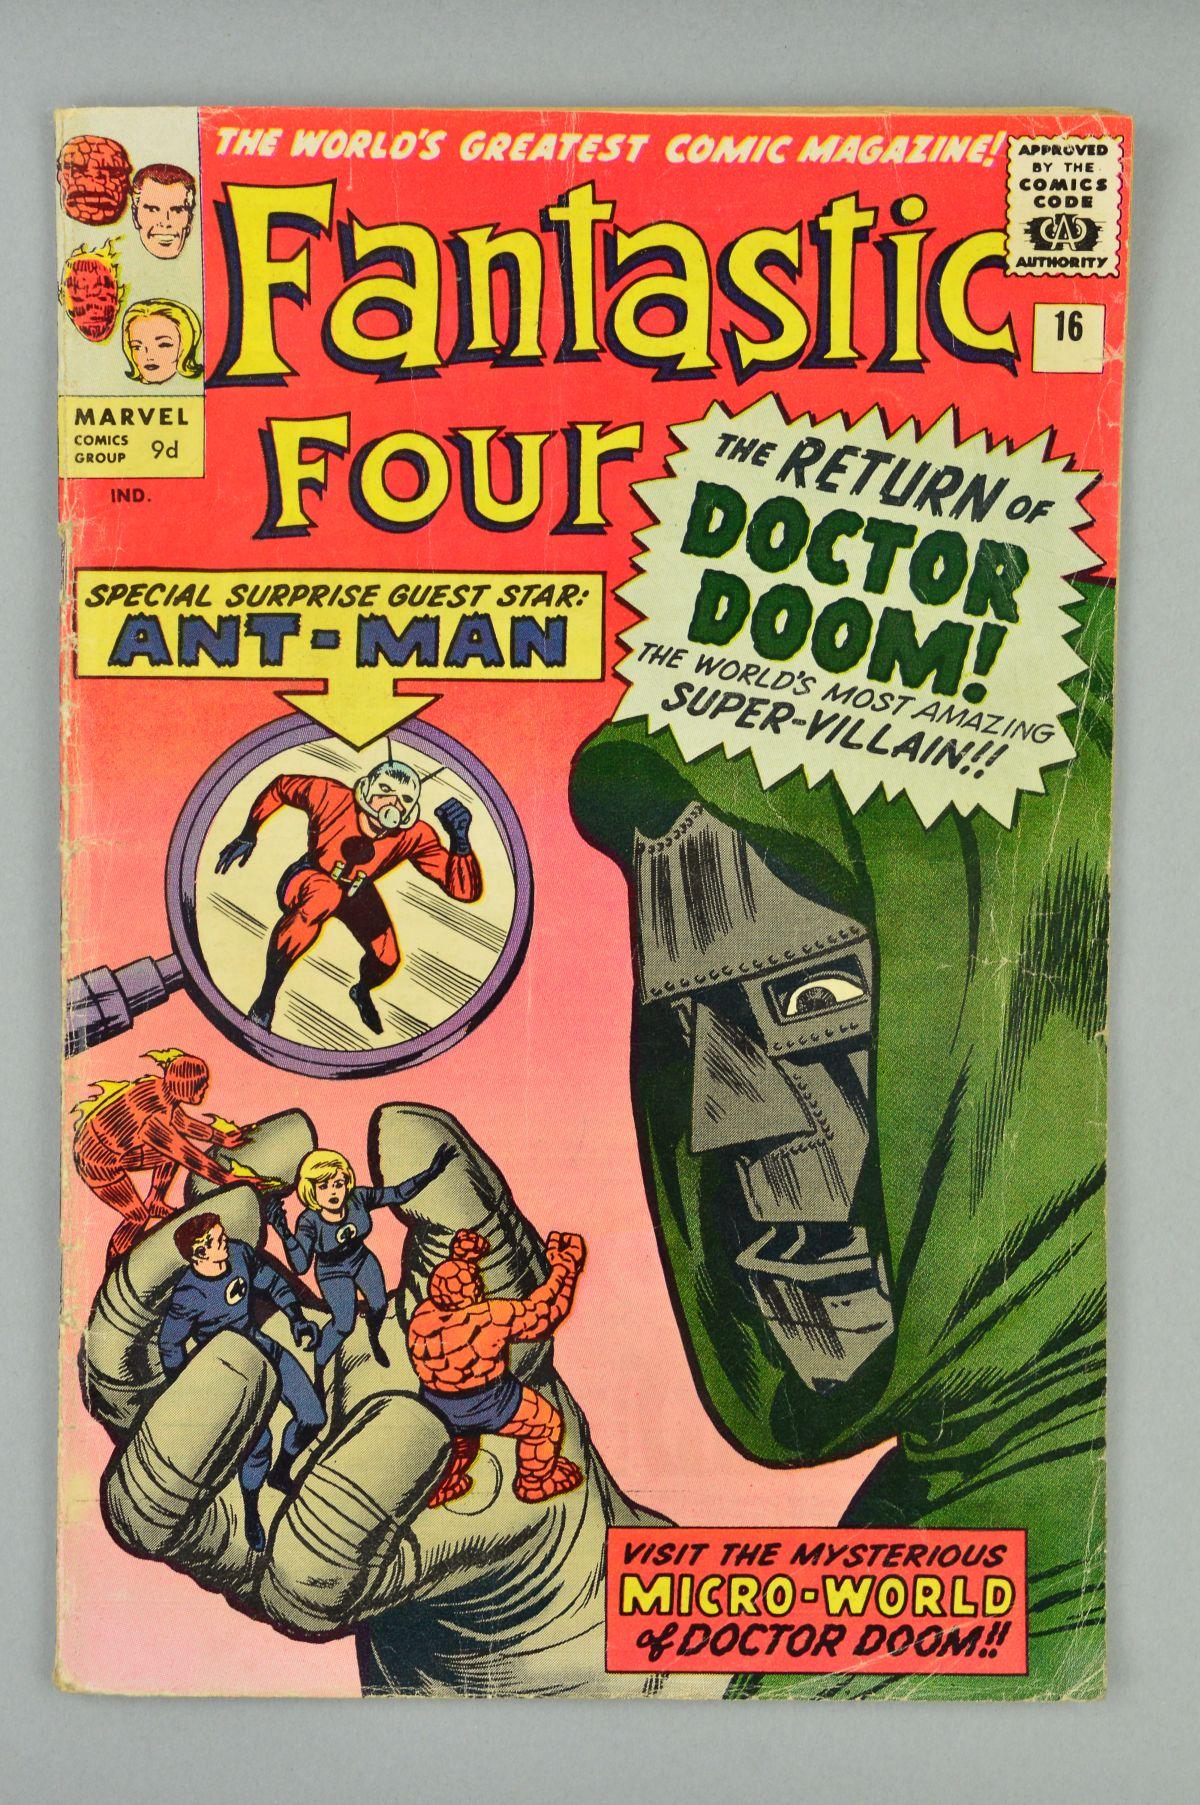 Lot 1816 - Fantastic Four (1961) #16, Published:July 10, 1963